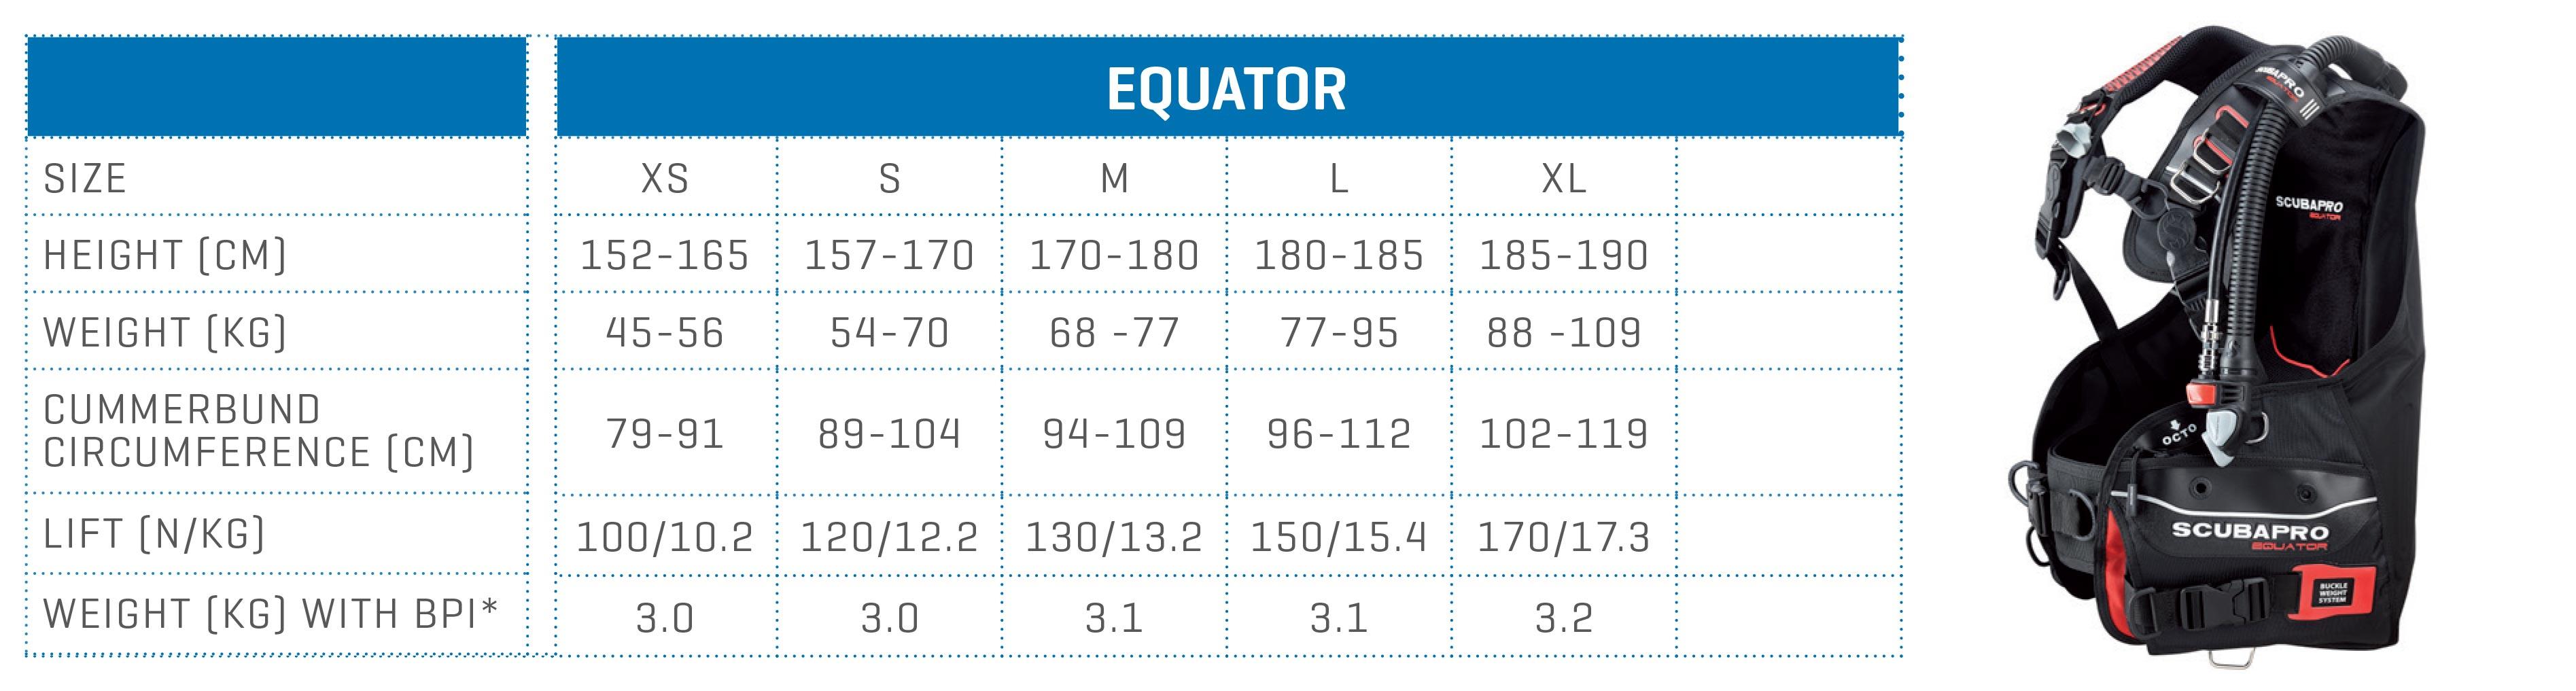 SCUBAPRO size chart BCD EQUATOR